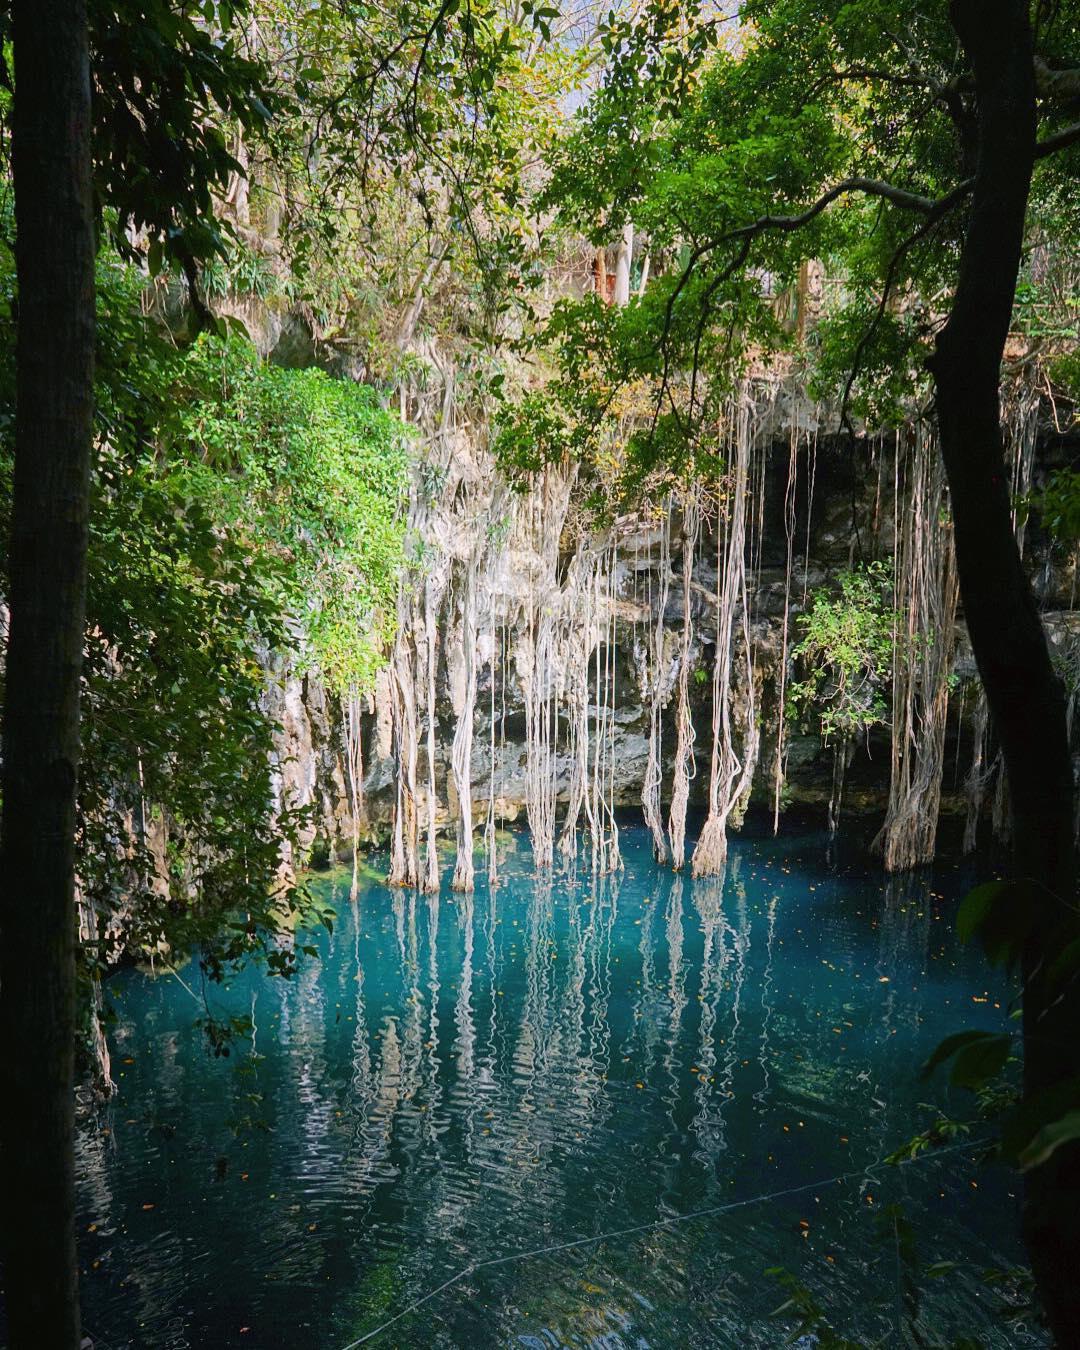 los cenotes mas hermosos de yucatan, cenote yokdzonot, top cenotes, top yucatan